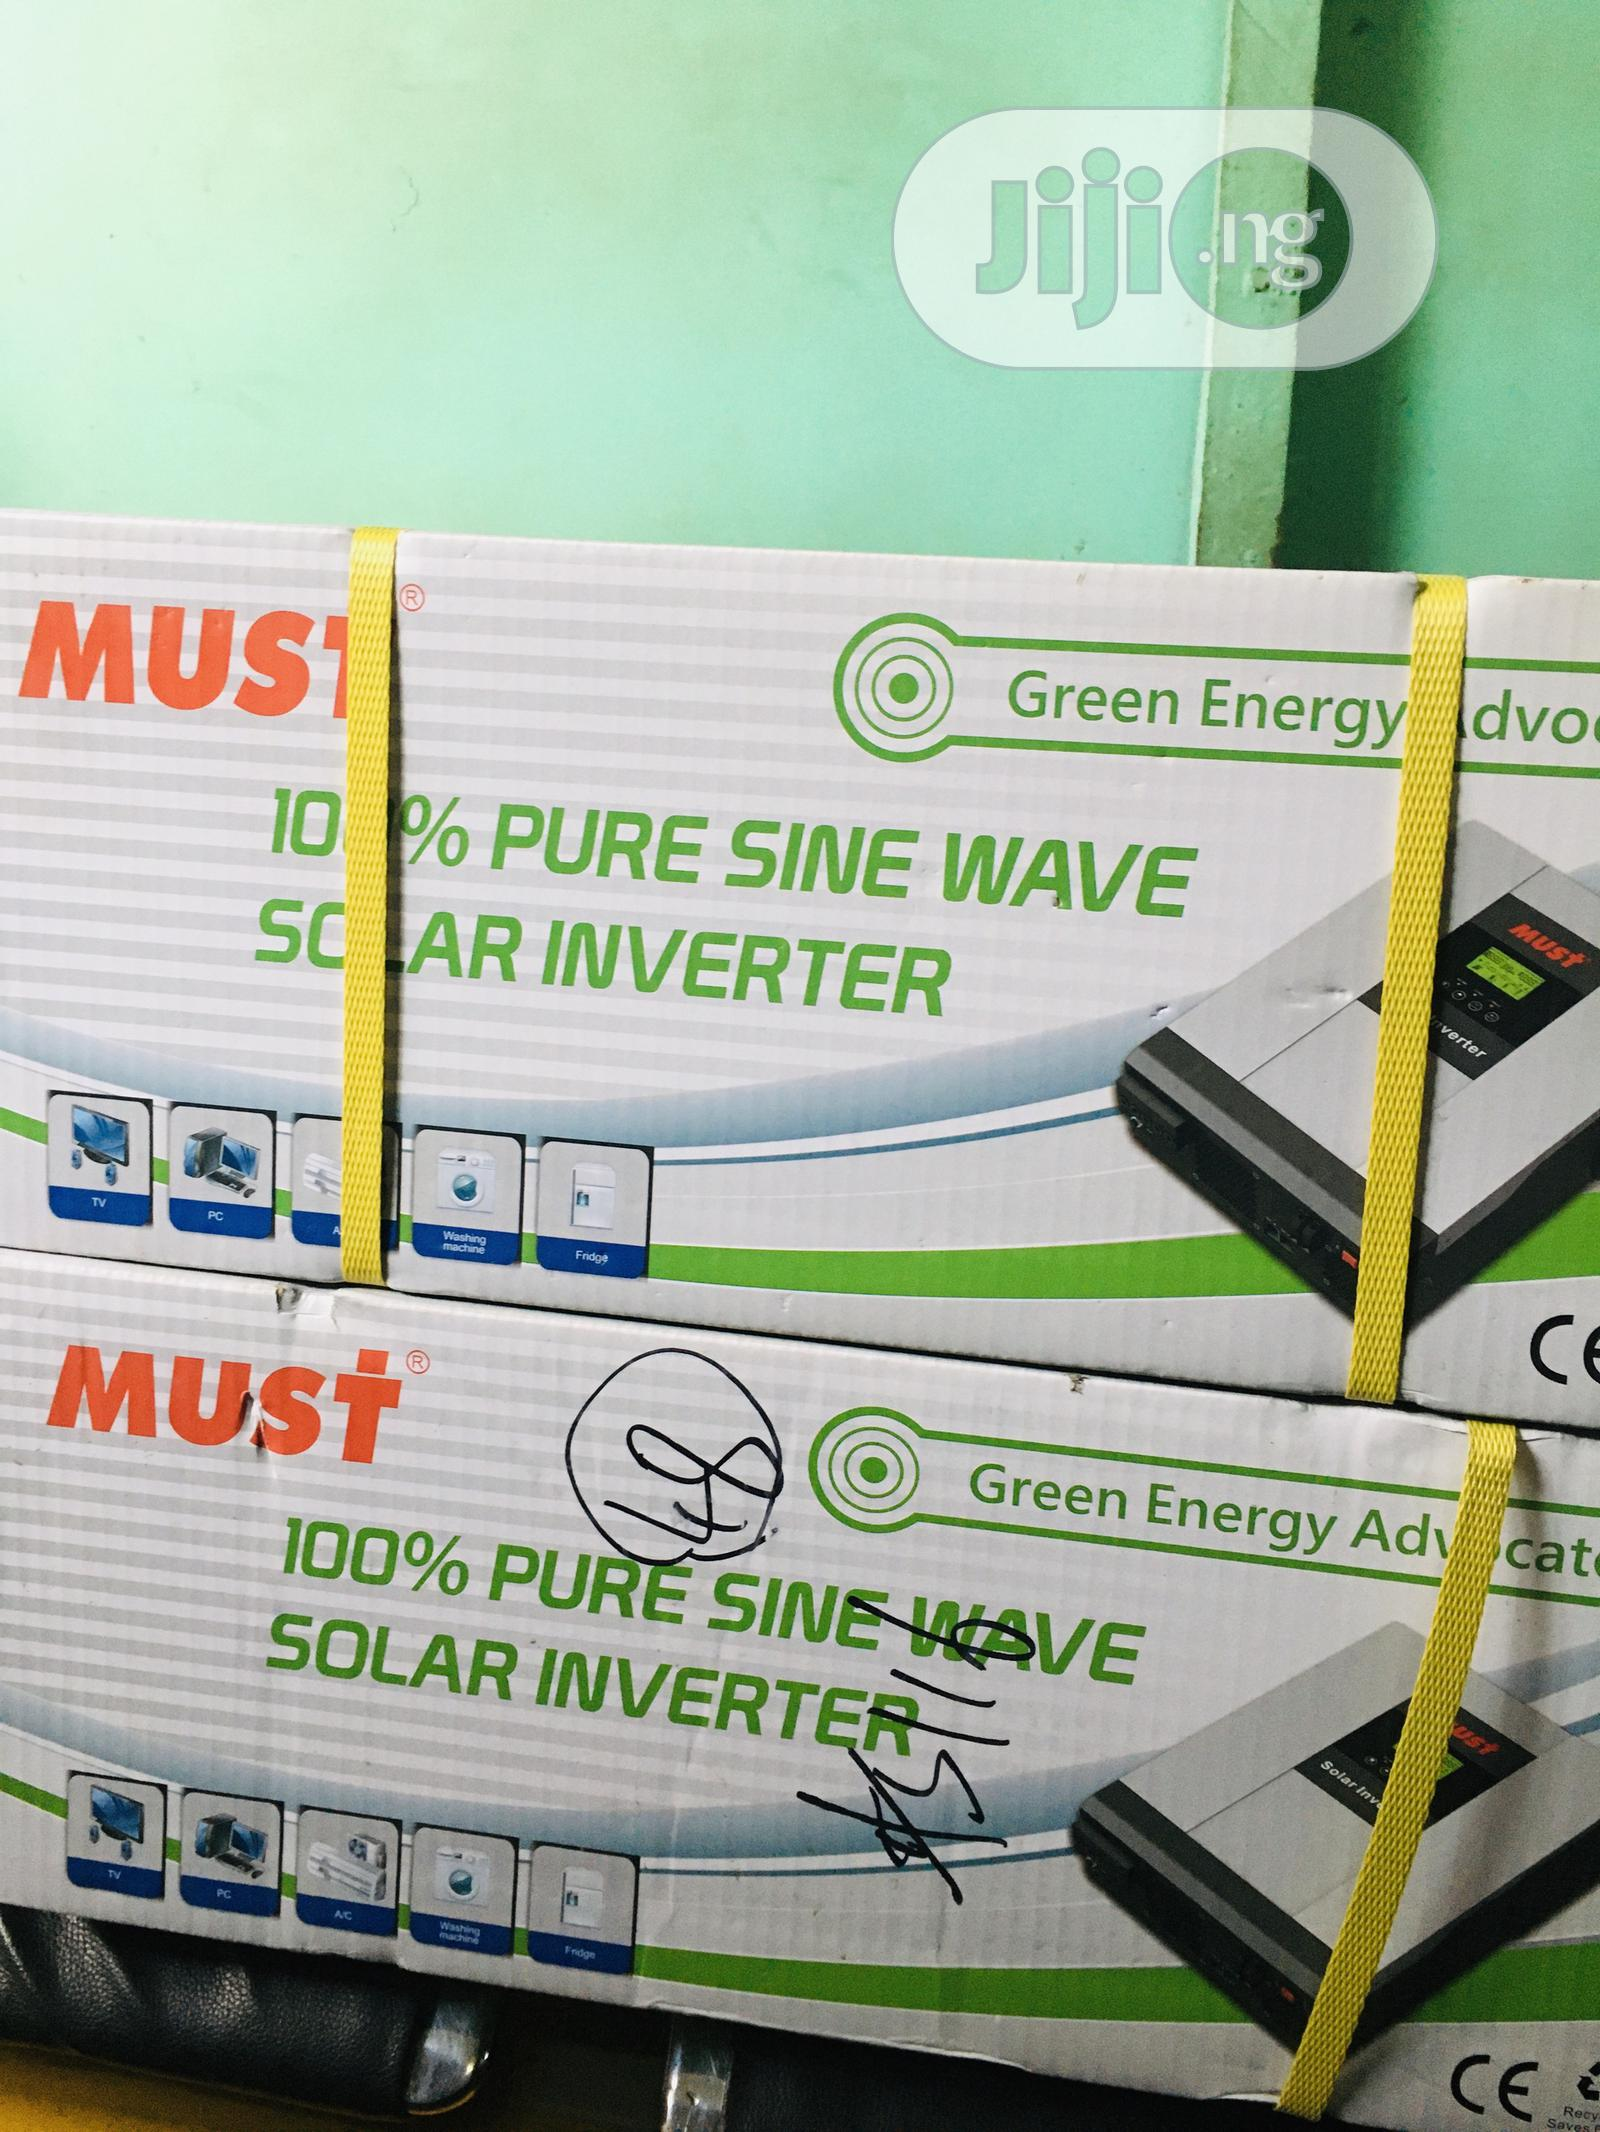 3kva 24v MUST Hybrid Inverter Is Available